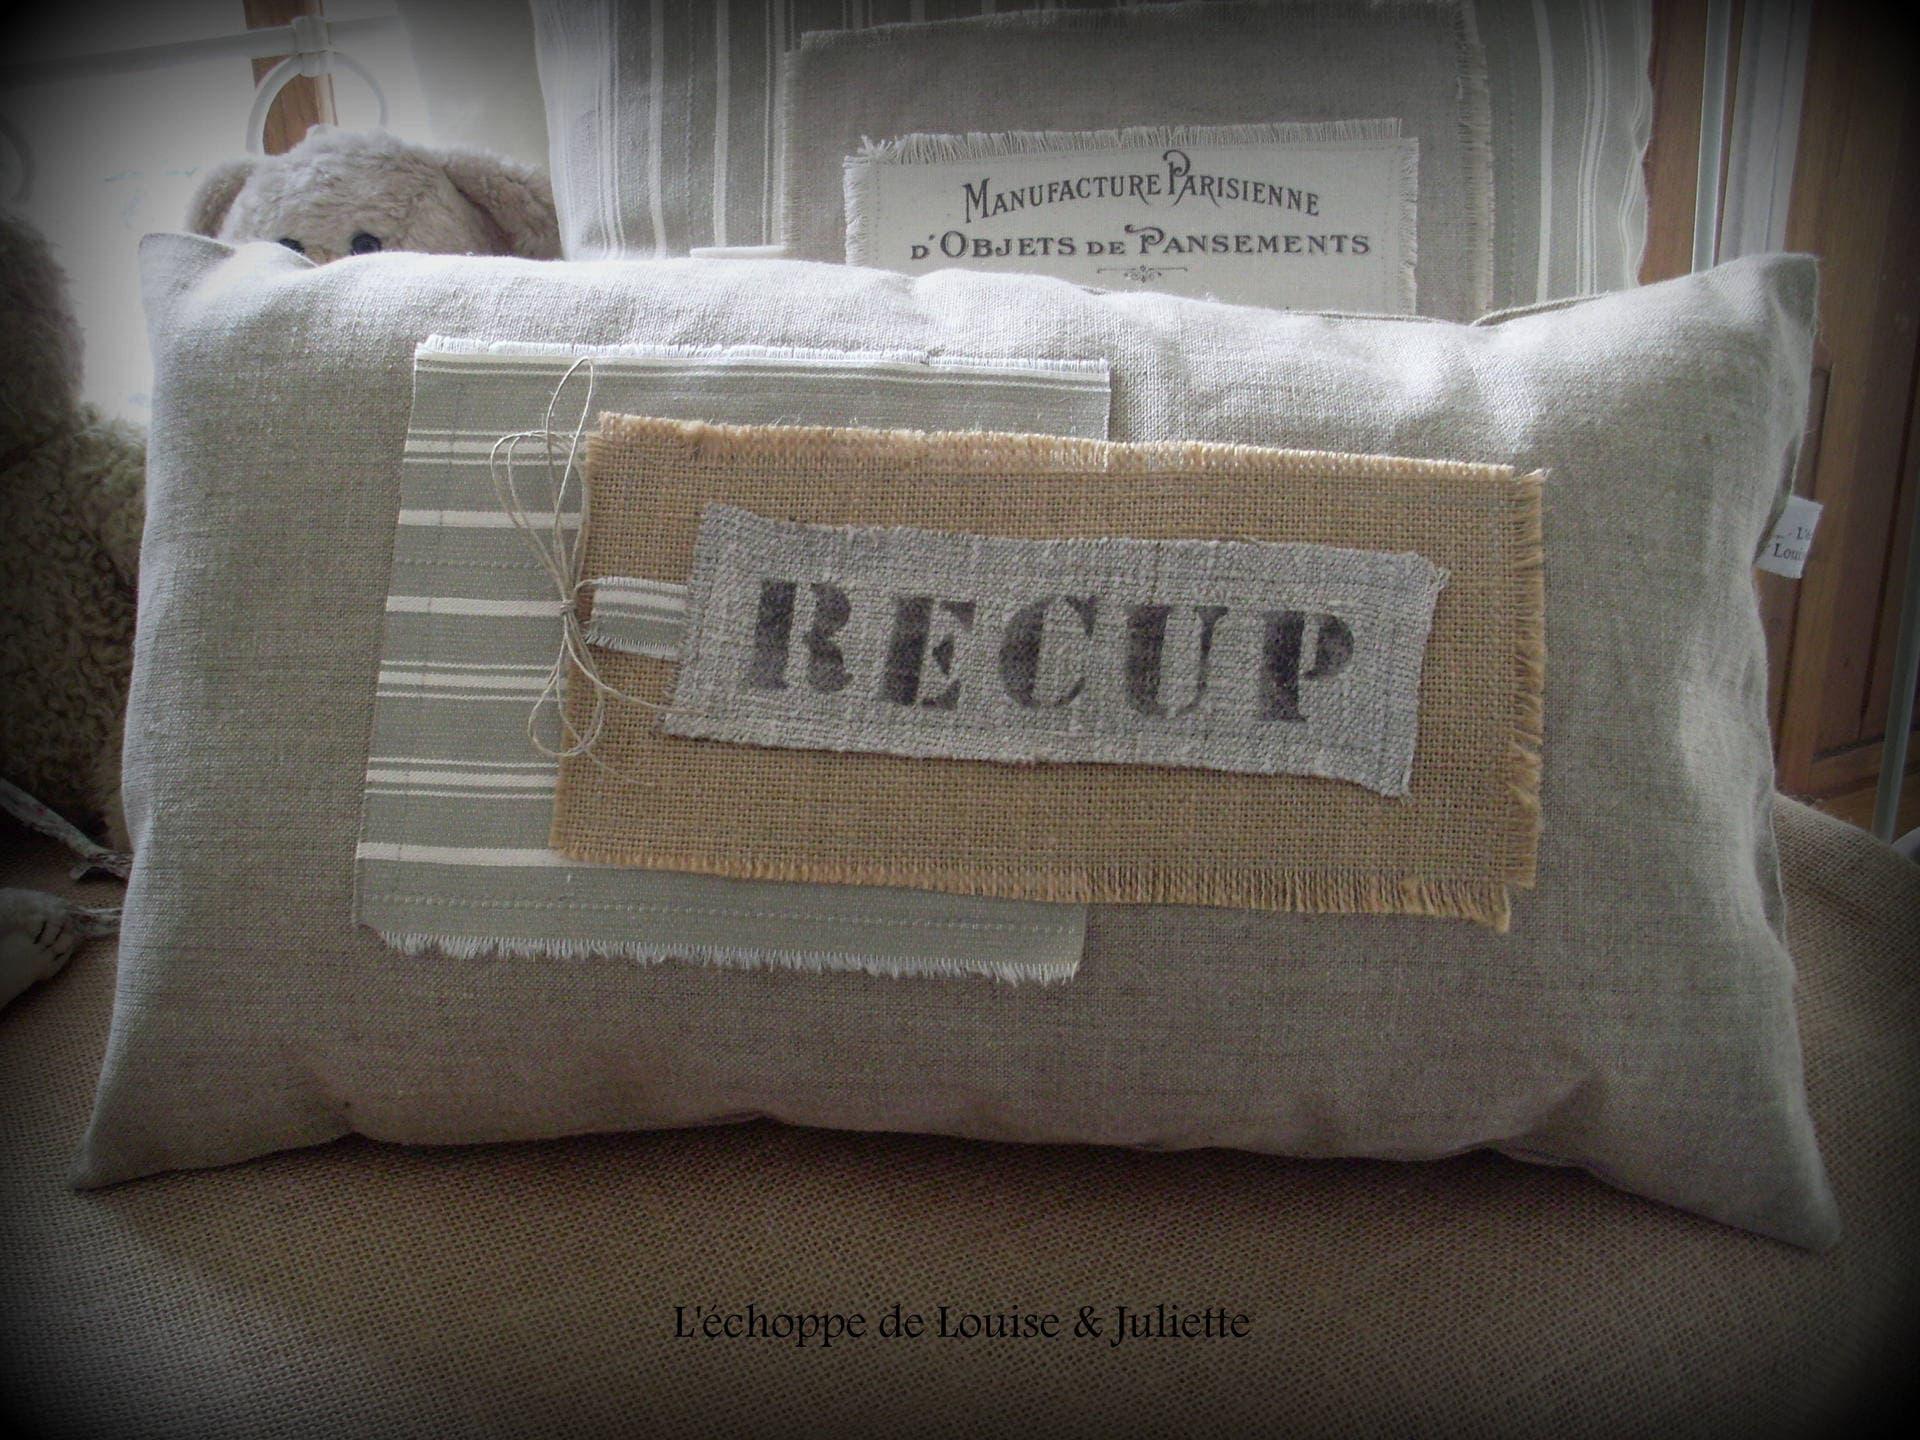 coussin industriel coussin imprim 100 lin motif. Black Bedroom Furniture Sets. Home Design Ideas